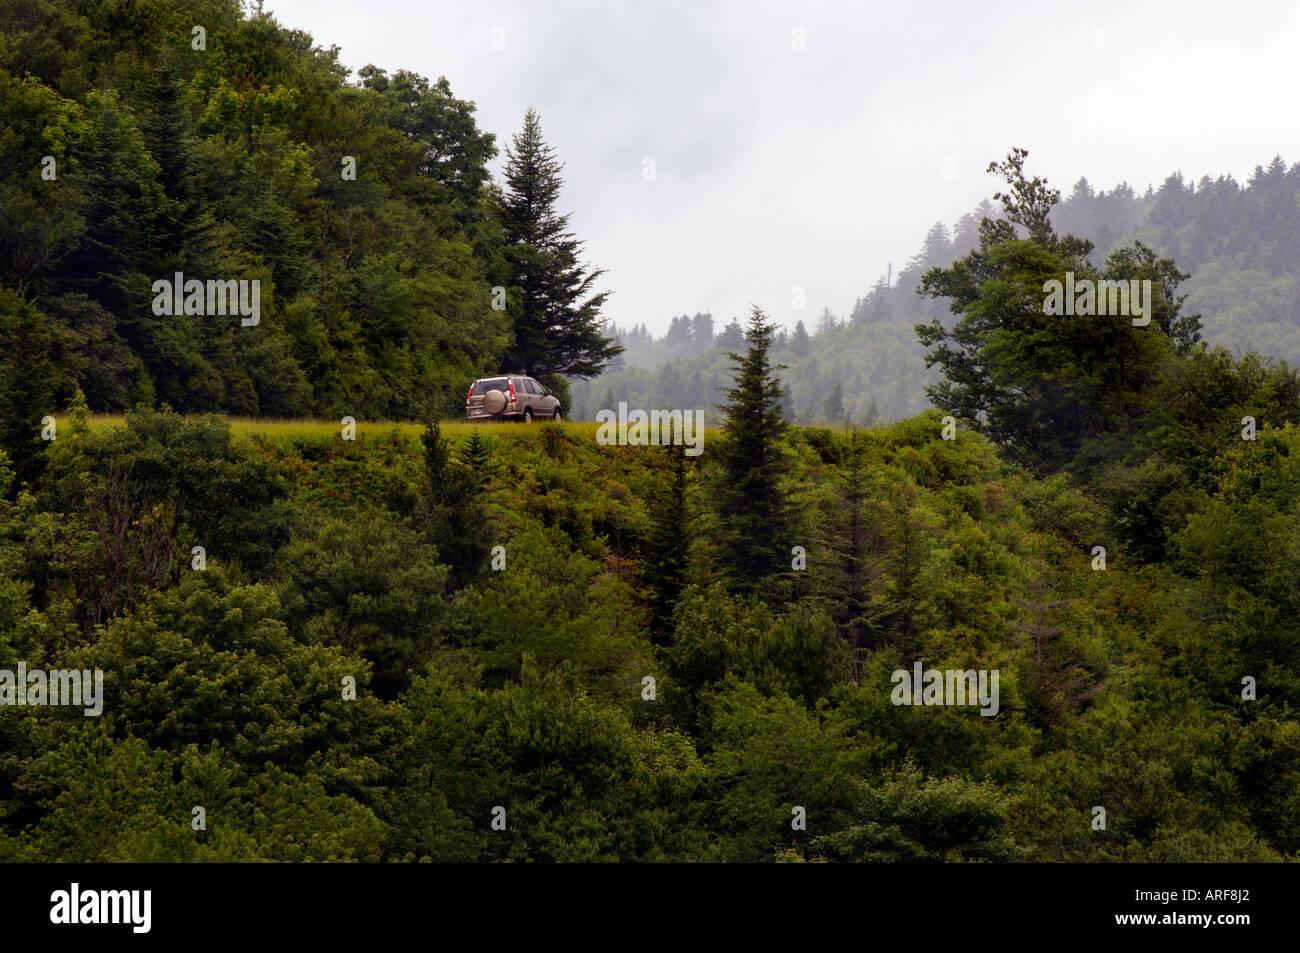 Honda CRV takes a curve on the scenic Blue Ridge Highway - Stock Image